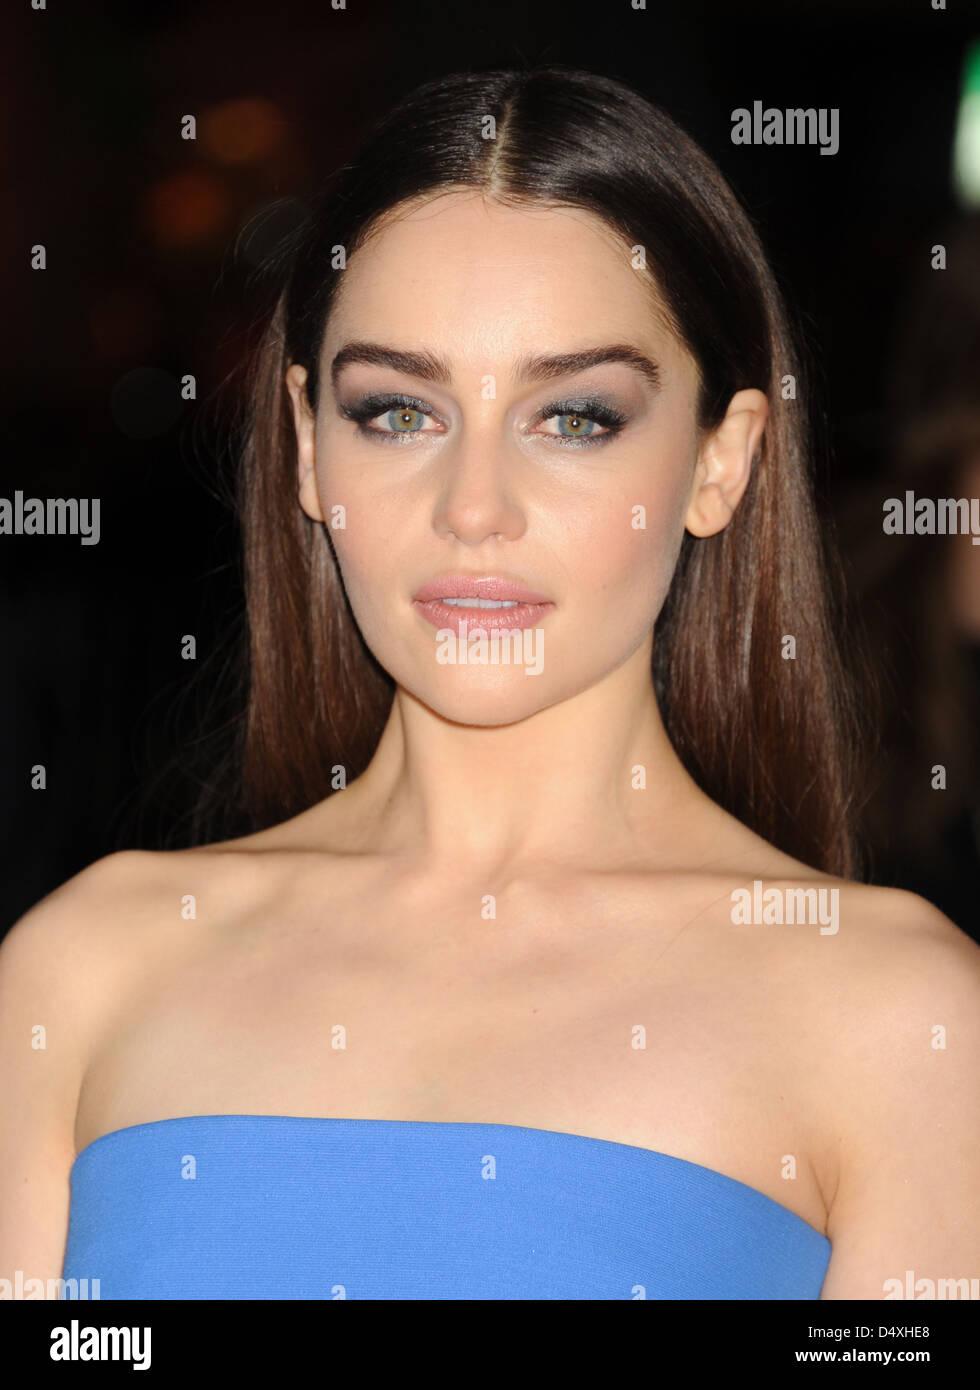 EMILIA CLARKE UK TV and film actress in March 2013. Photo Jeffrey Mayer - Stock Image